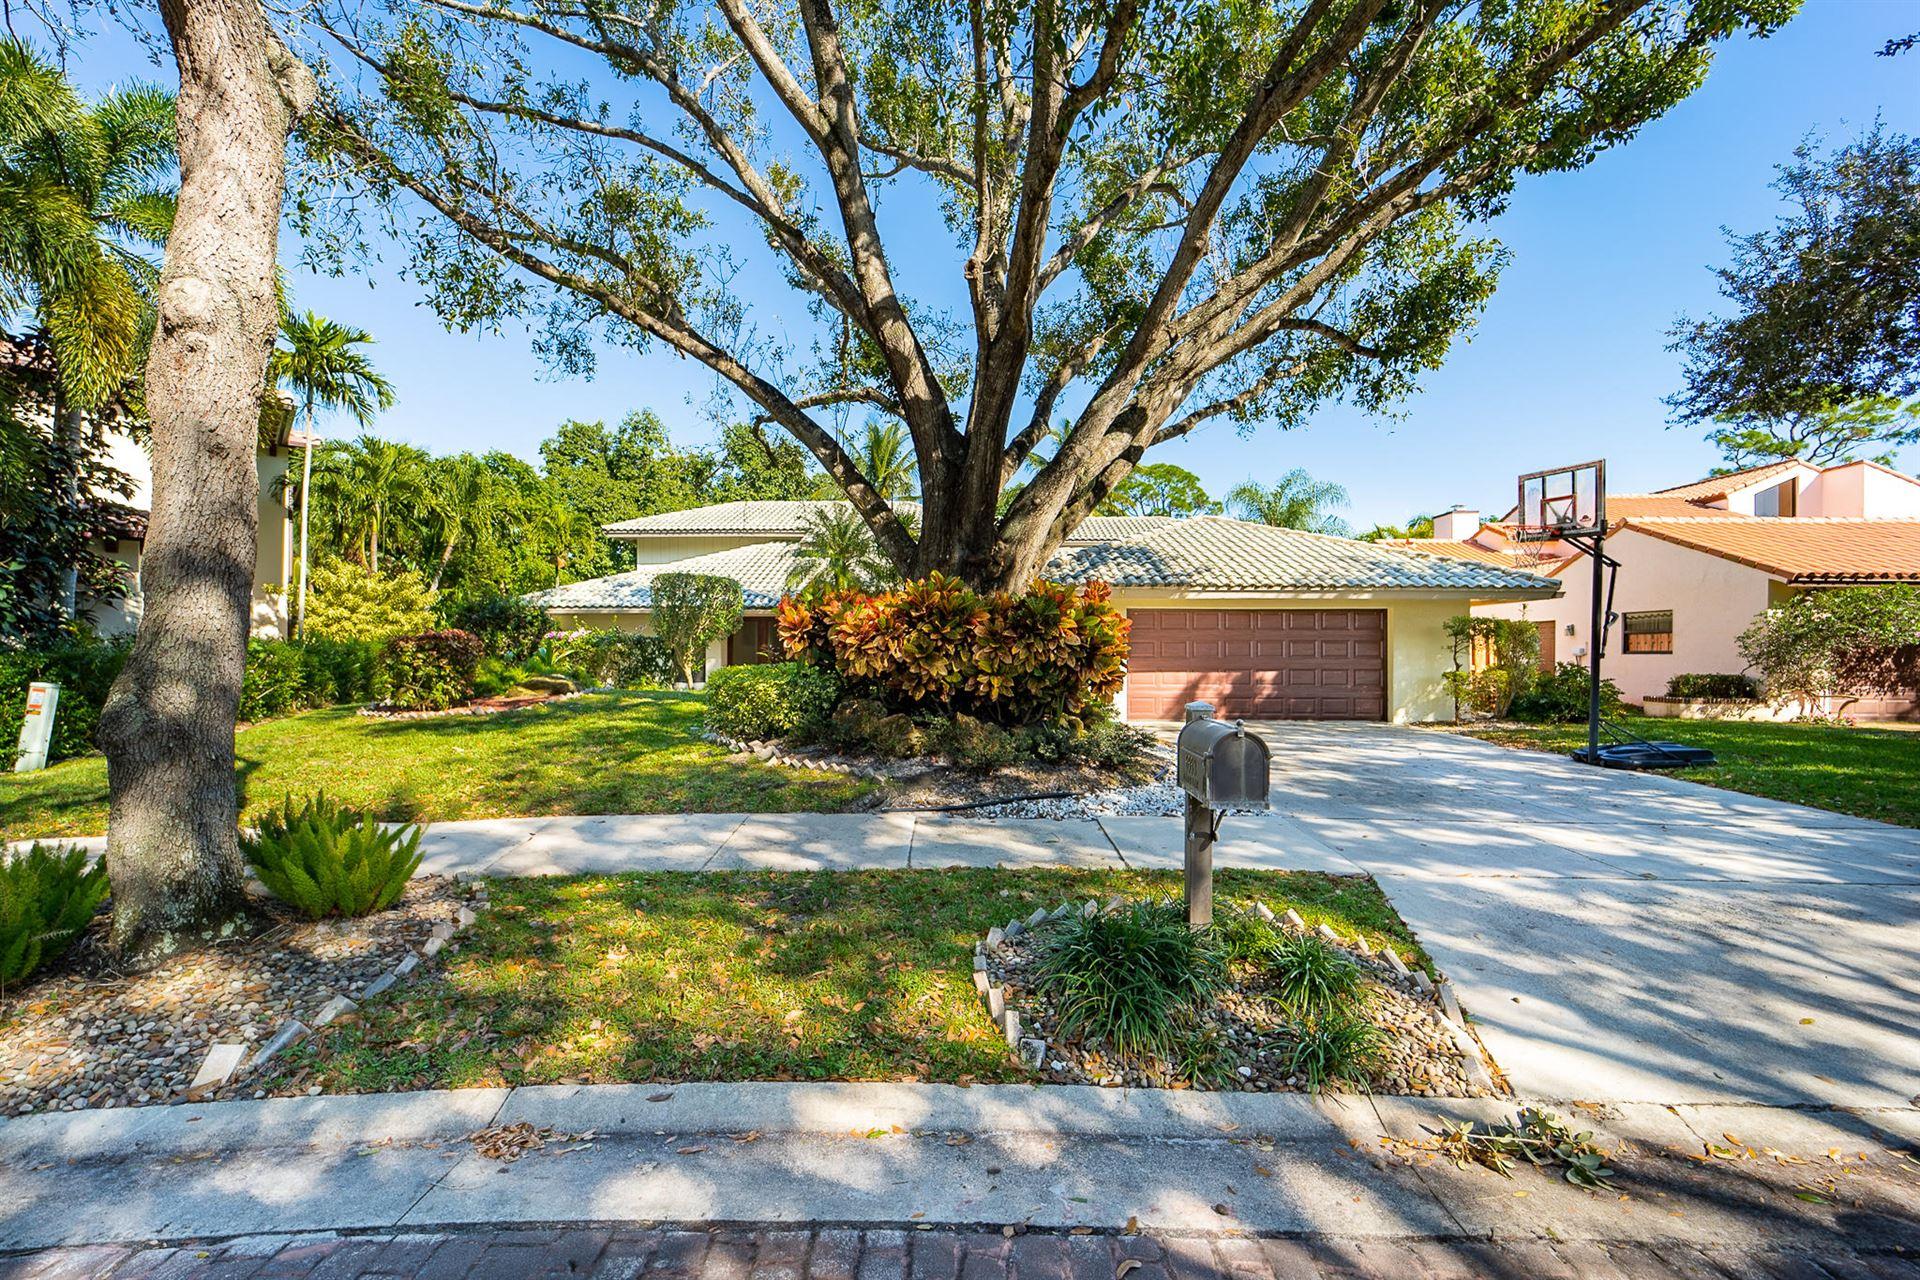 6553 Timber Lane, Boca Raton, FL 33433 - #: RX-10676012